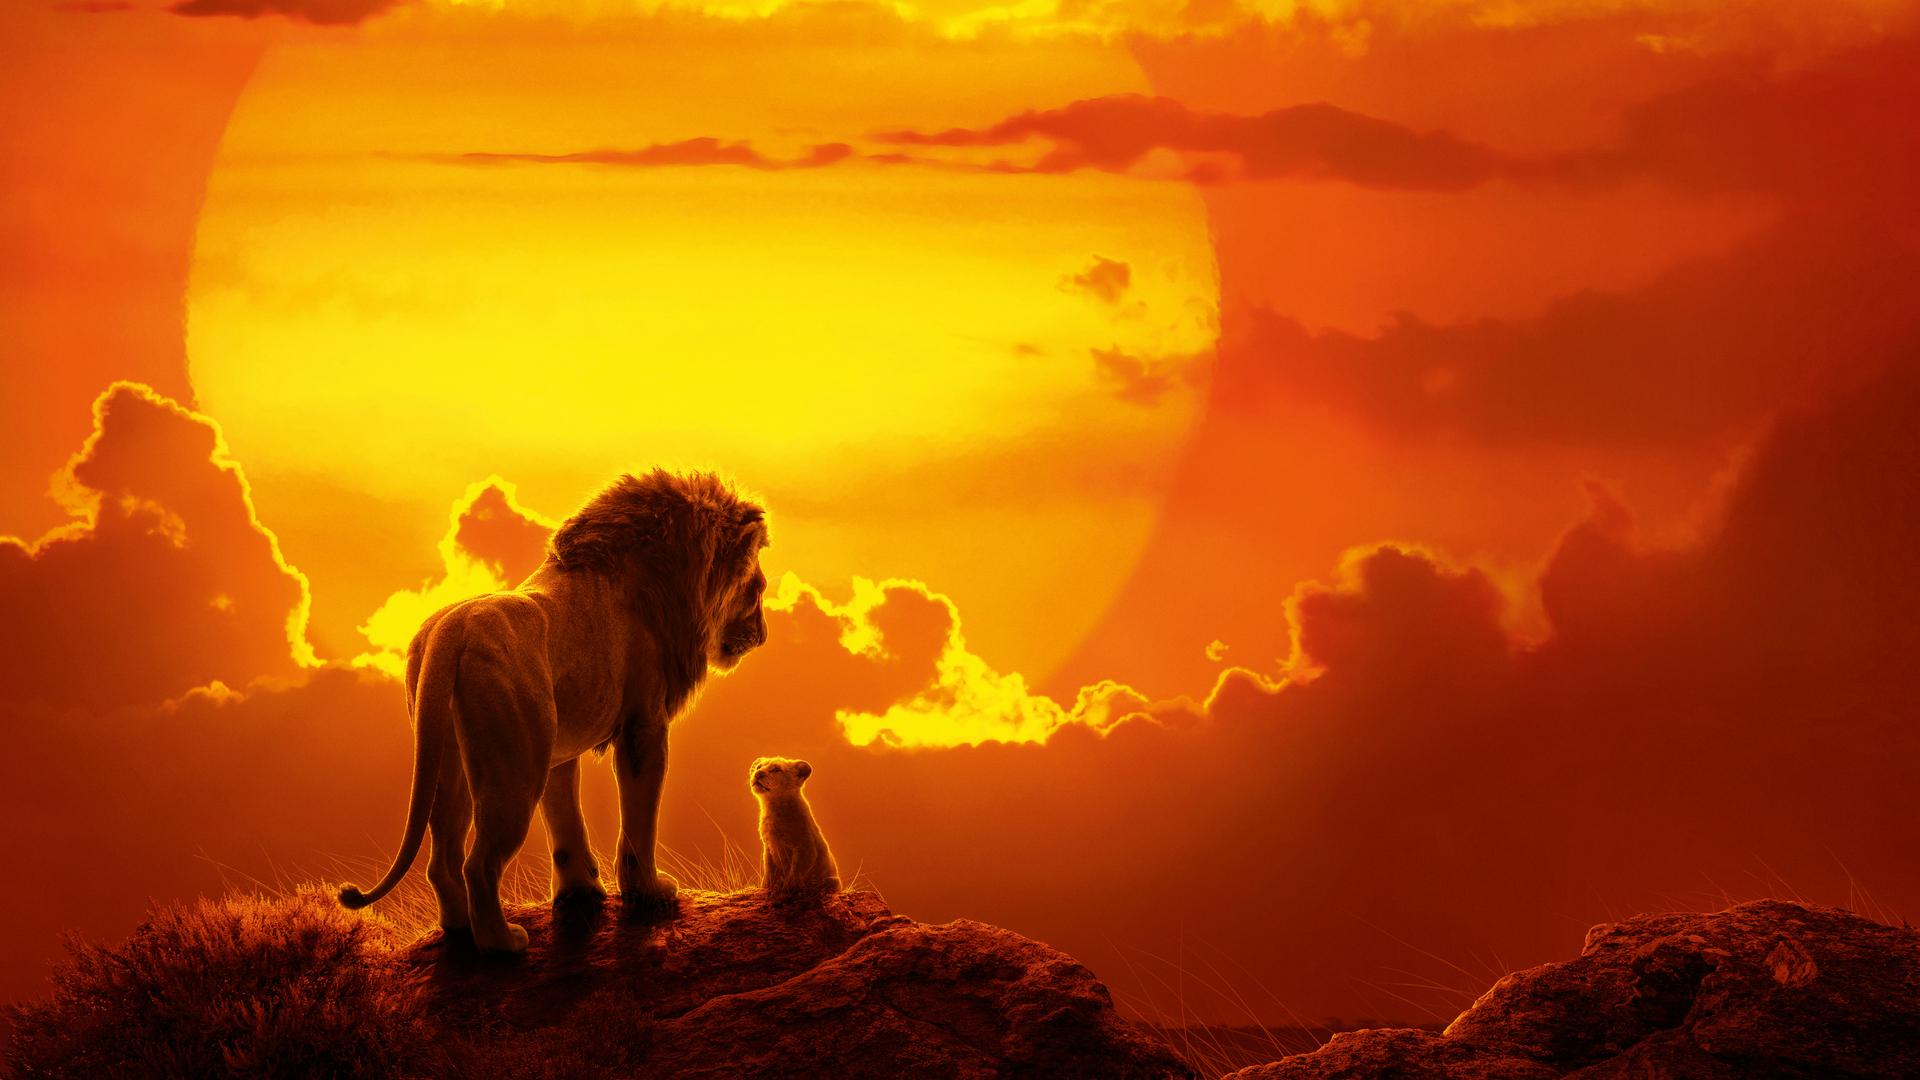 1920x1080 The Lion King Movie 8k Laptop Full Hd 1080p Hd 4k